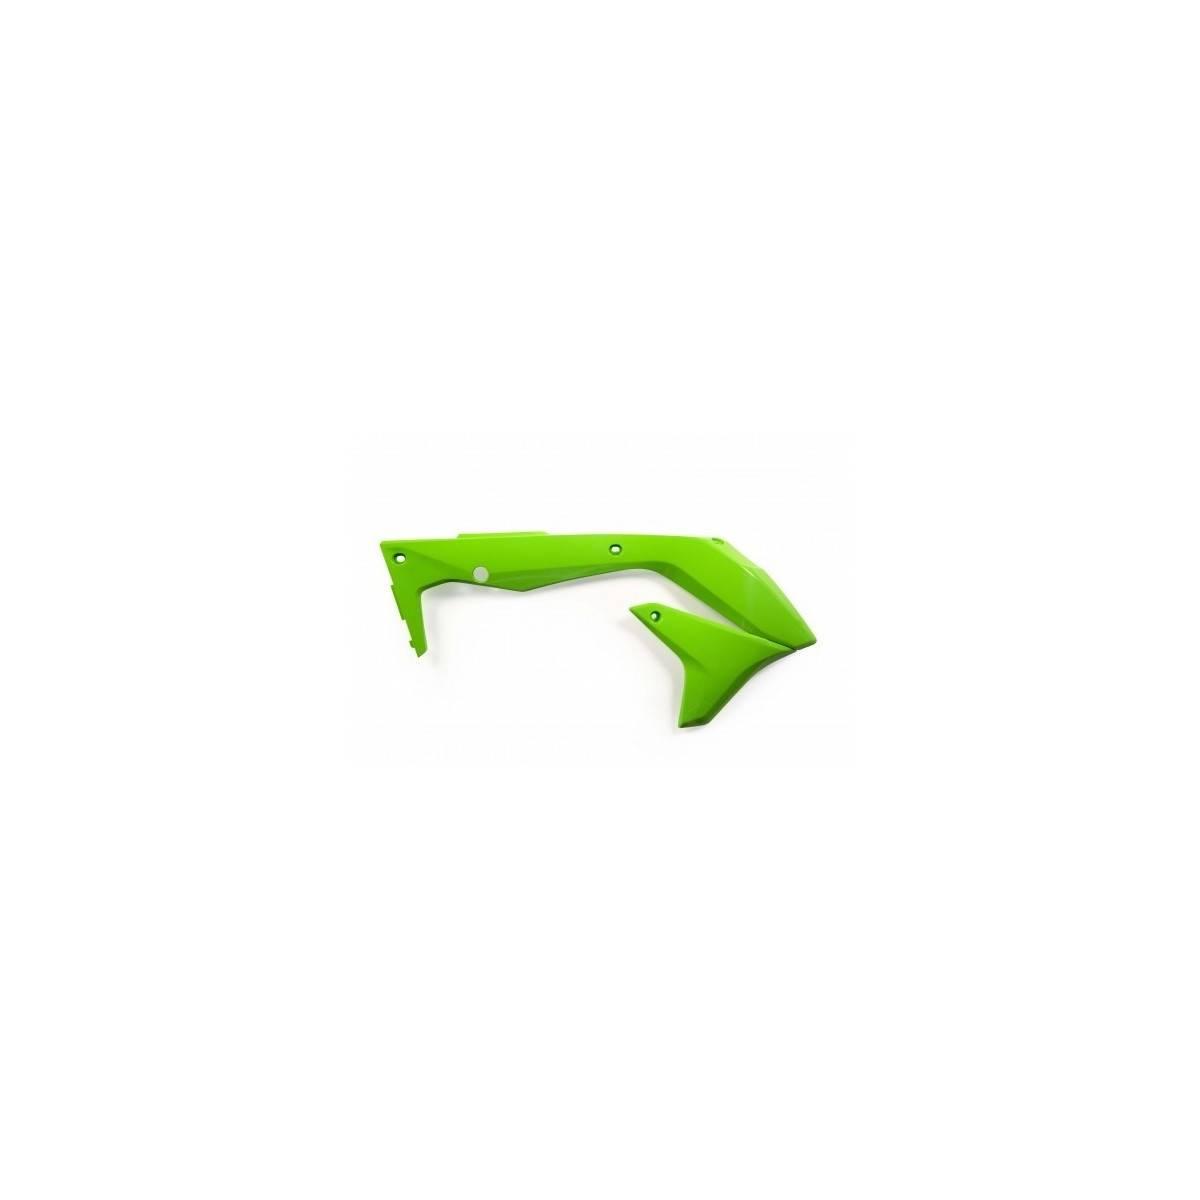 0021837-130 - Tapa Radiador Kx-F 450 16 18 Verde